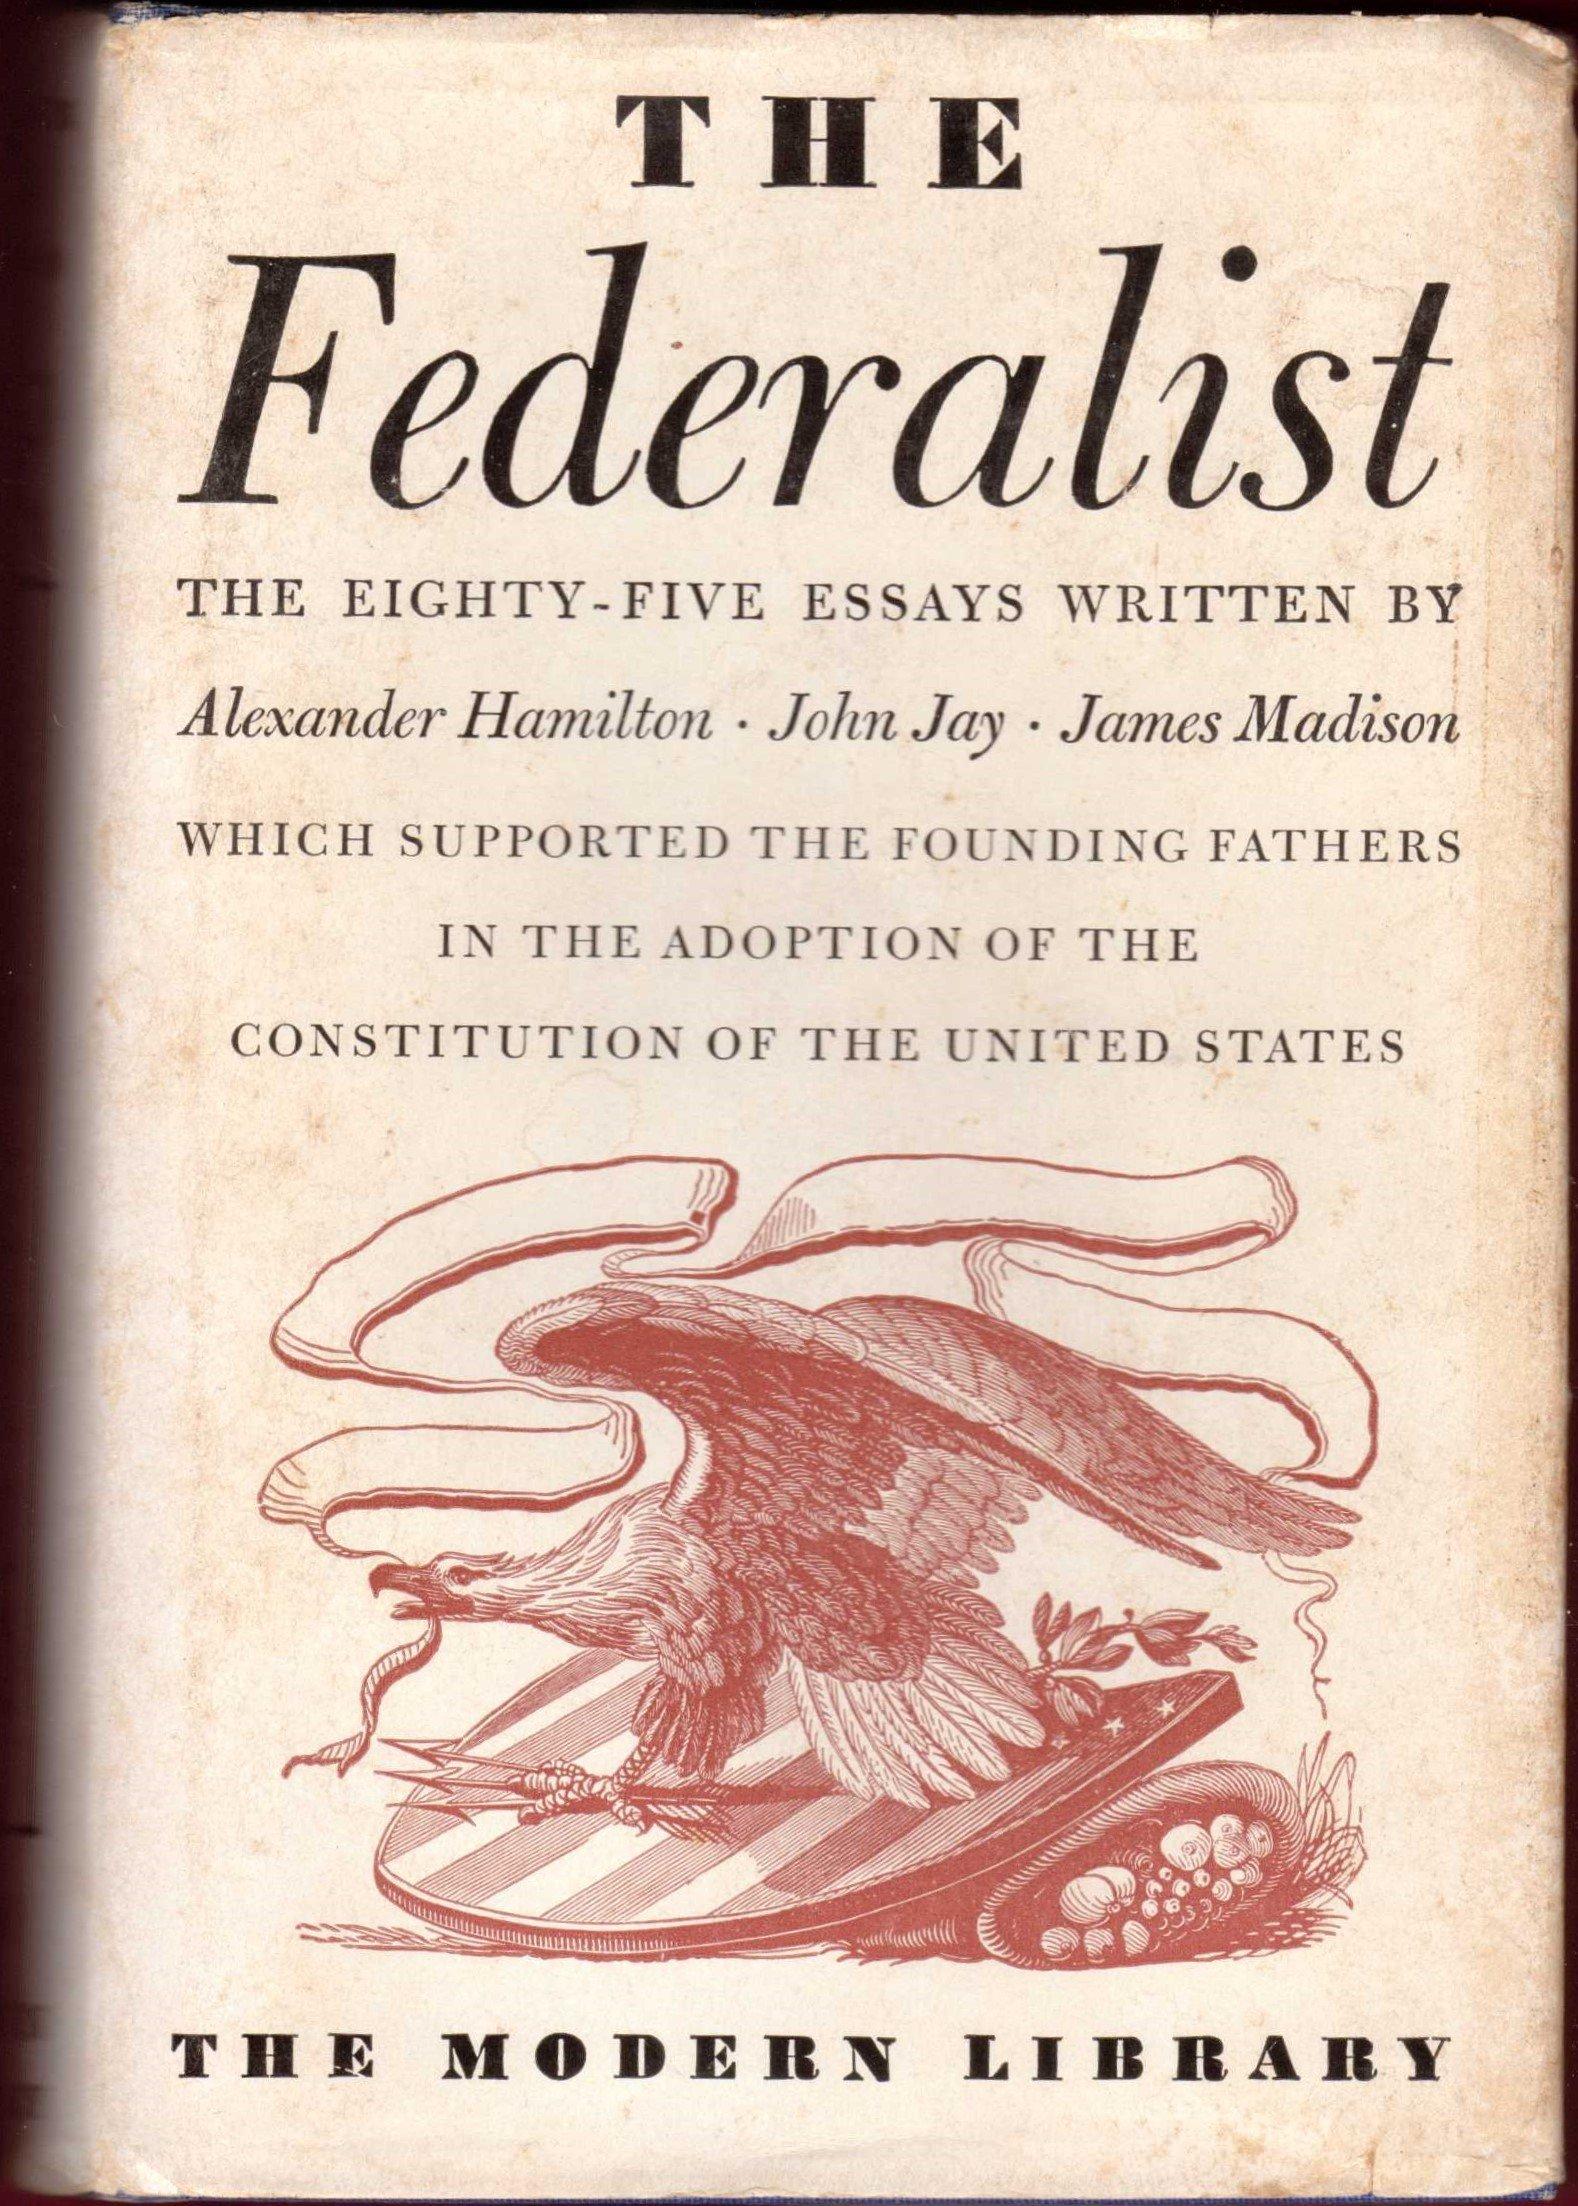 012 Alexander Hamilton Essays 91n4zdfy2el Essay Frightening Federalist Papers 1 Pdf Guns Full